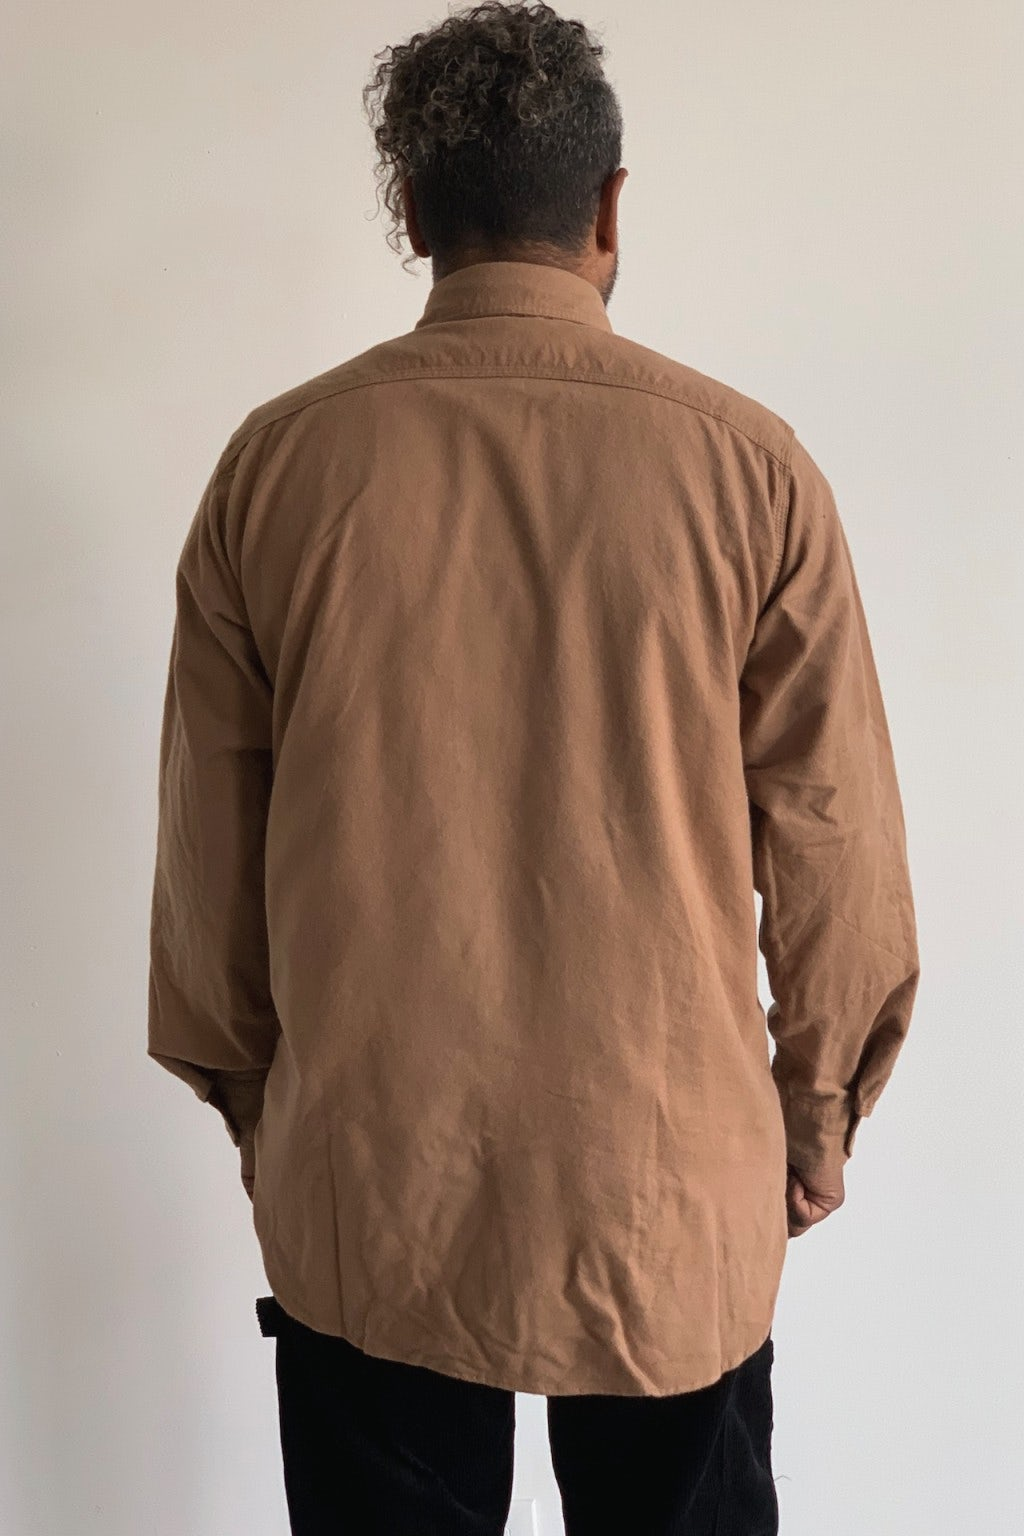 Engineered Garments Work Shirt  Khaki Solid Cotton Flannel